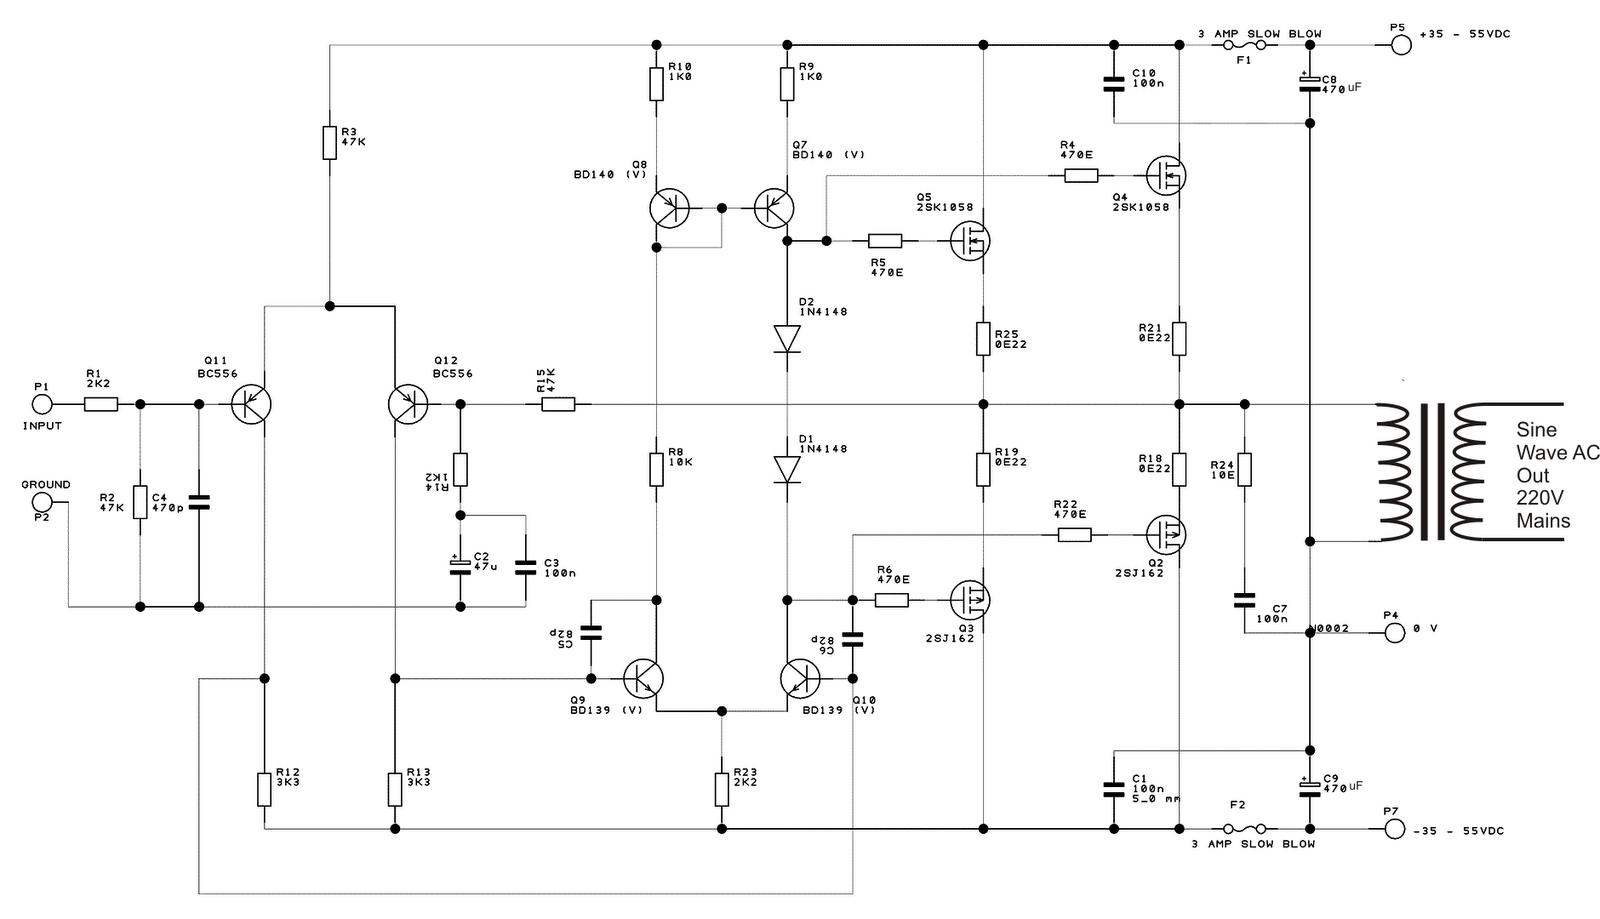 Wiring Diagram For Homemade Generator : Homemade solar generator wiring diagram inverter